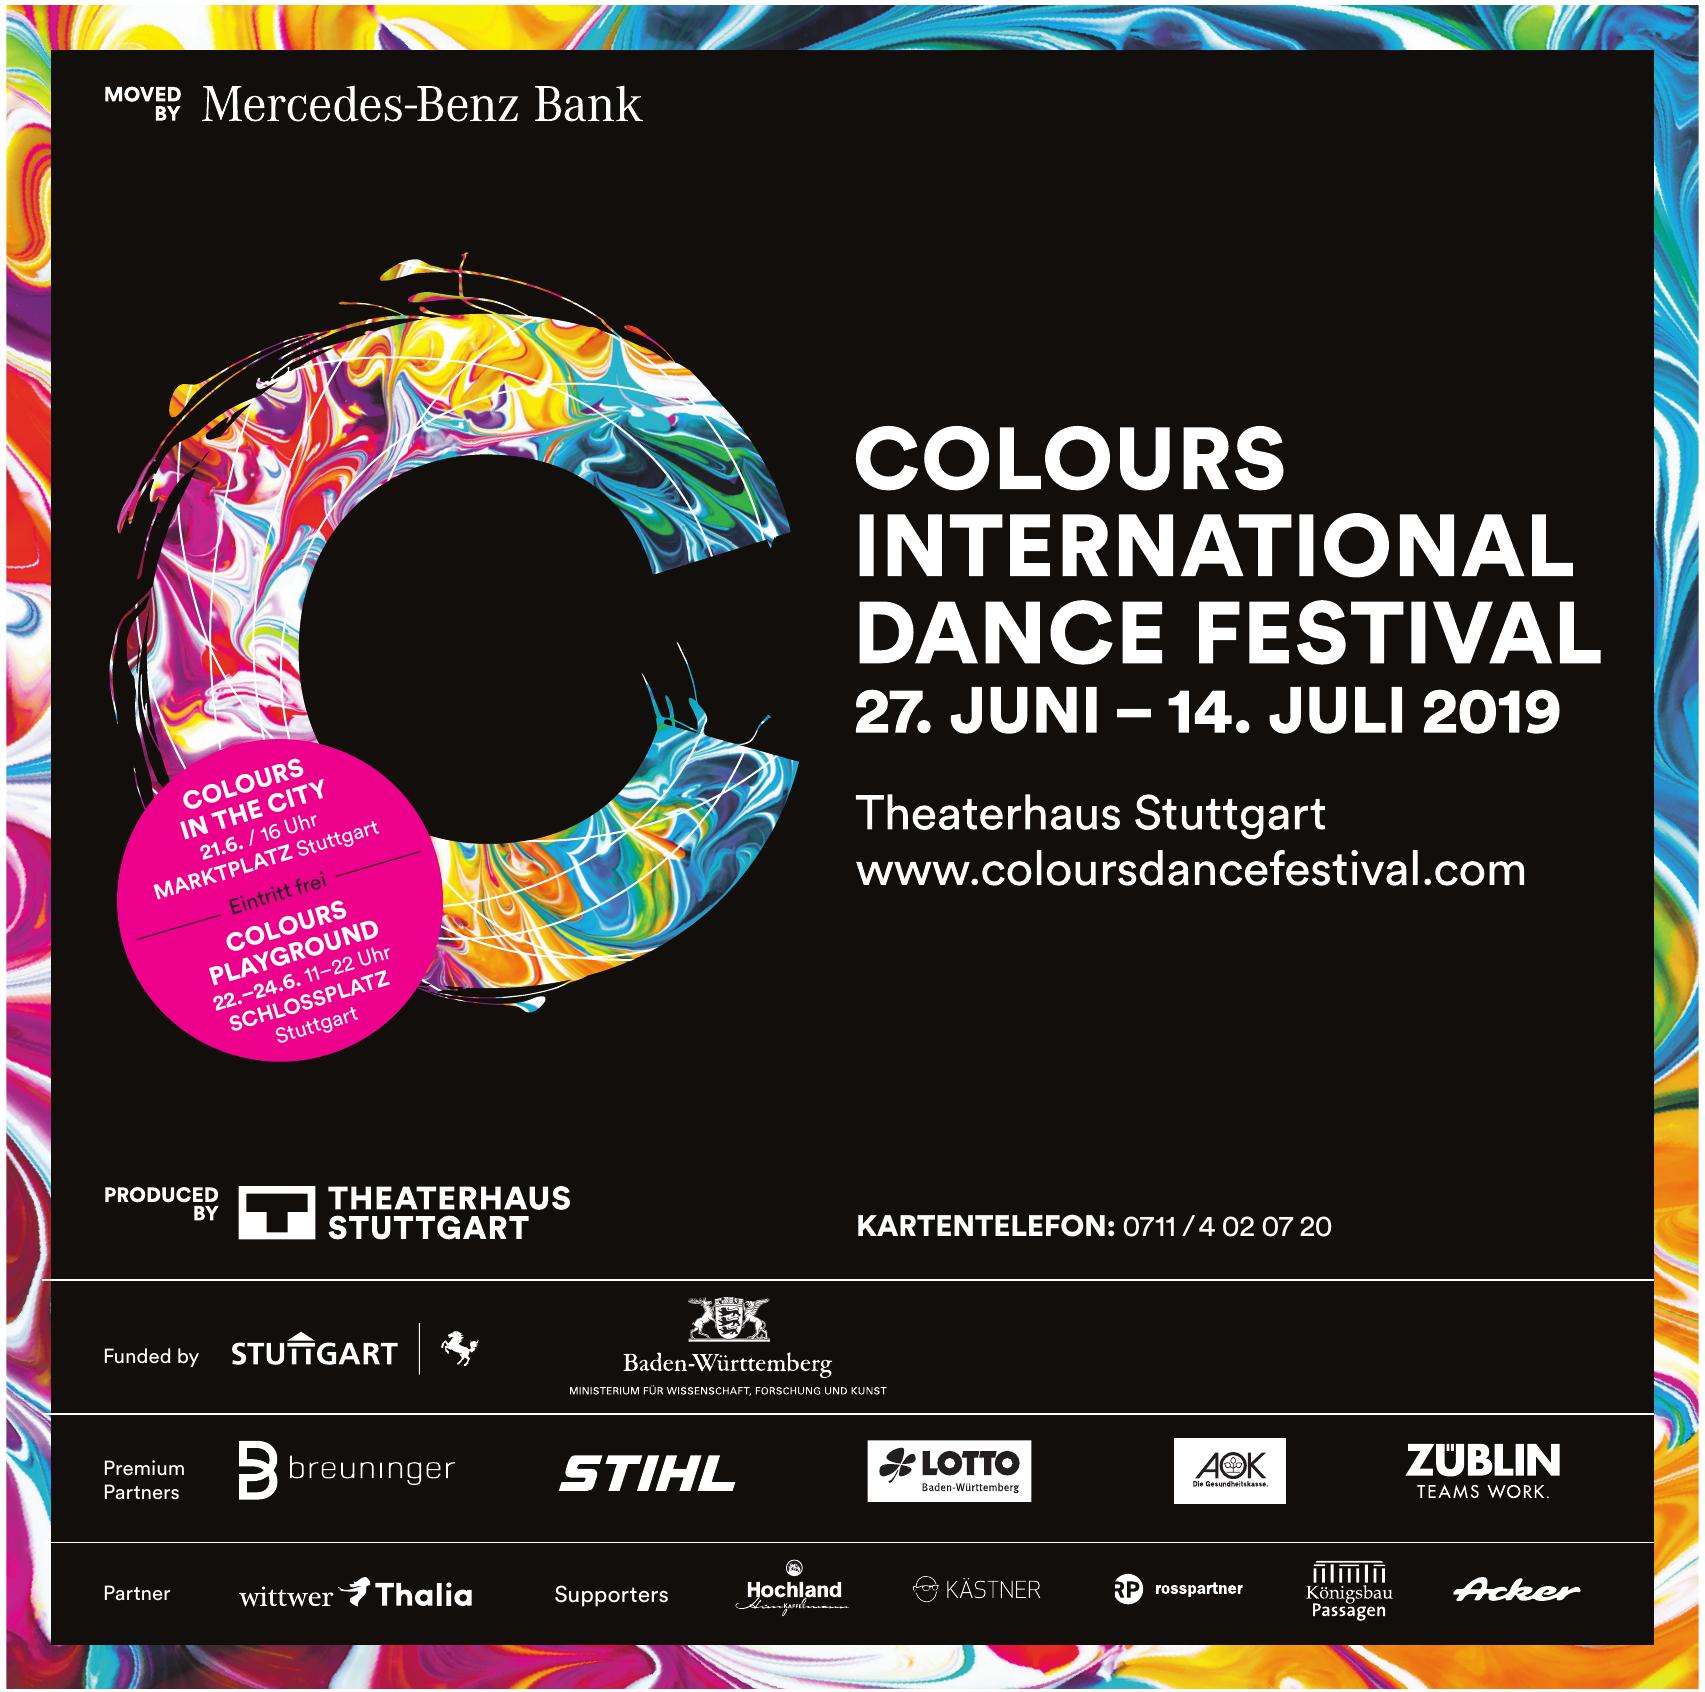 Colours International Dance Festival